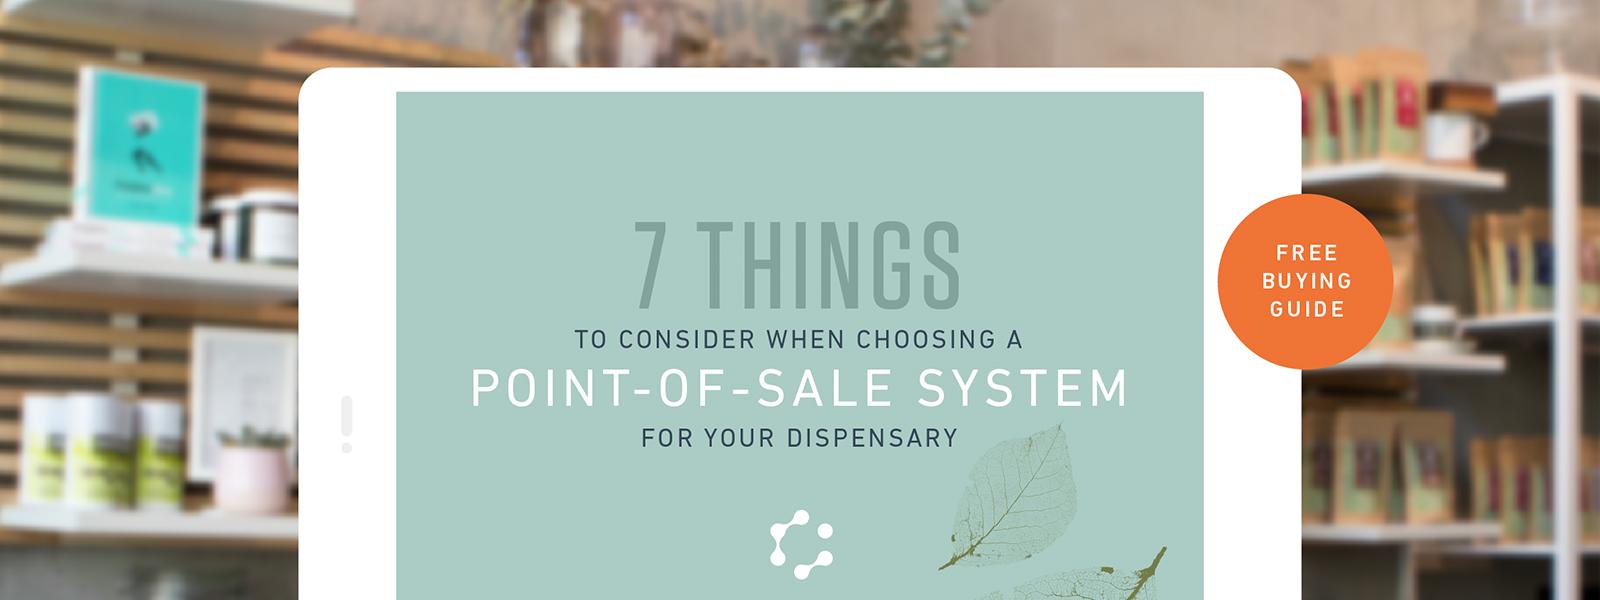 7 Things to Consider Choosing POS Dispensary